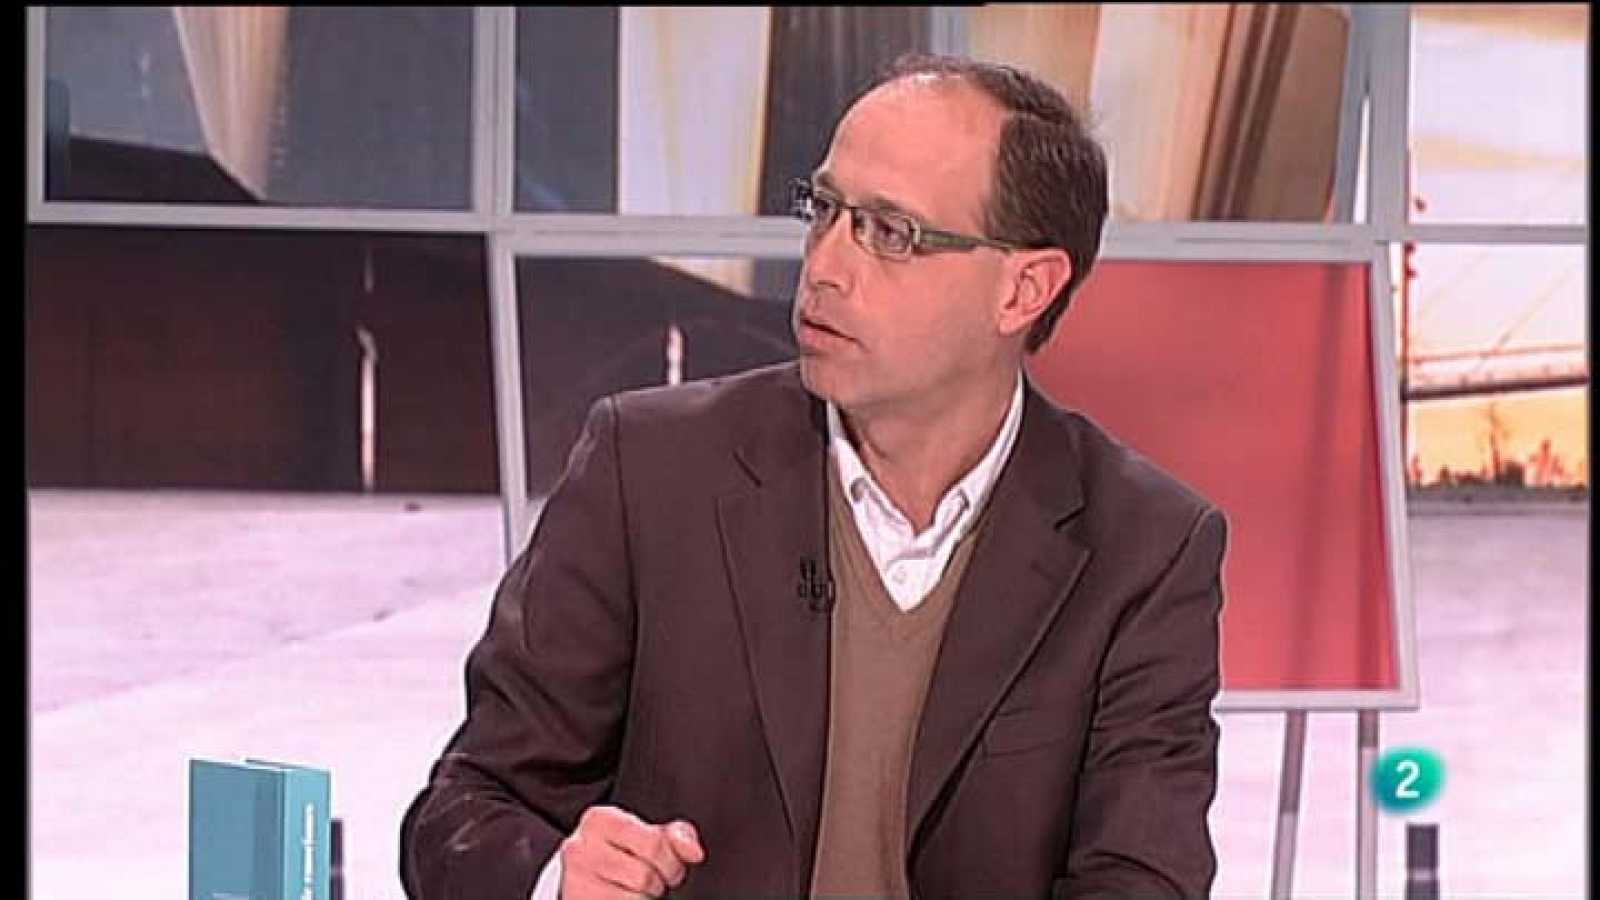 Para Todos La 2 - Entrevista: Francesc Torralba - Envidia